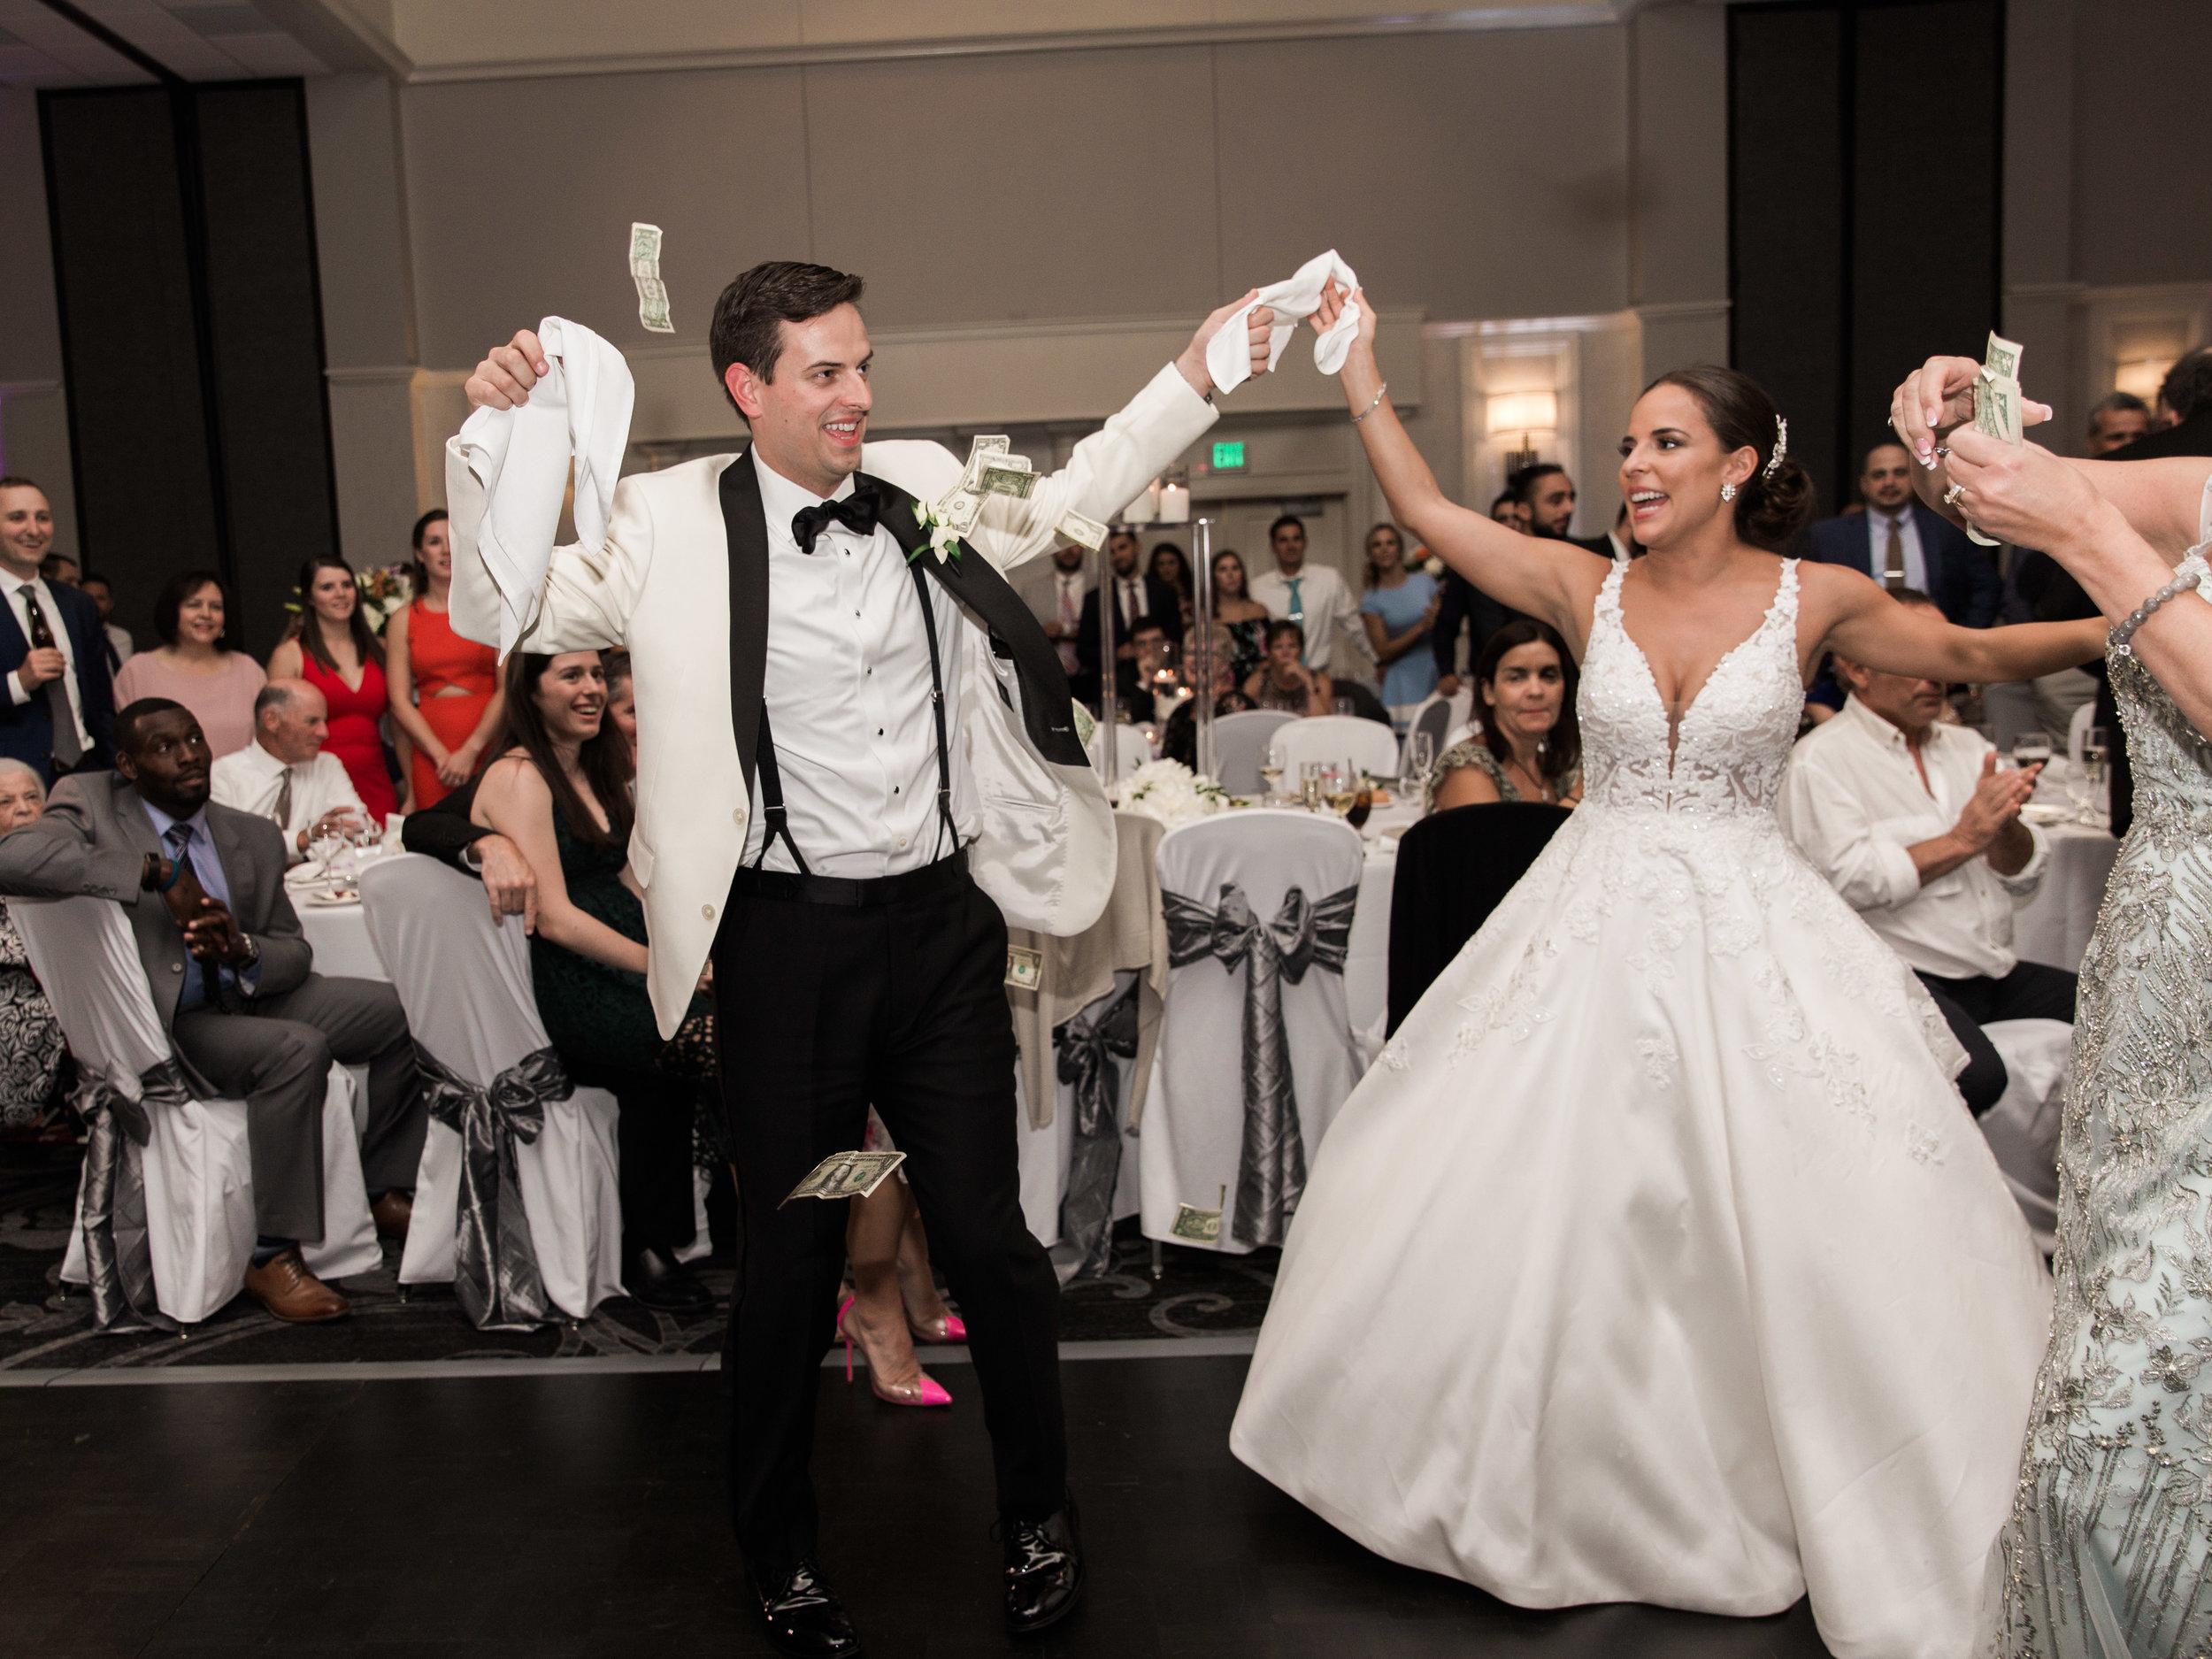 Bonphotage Milwaukee Fine Art Wedding Photography